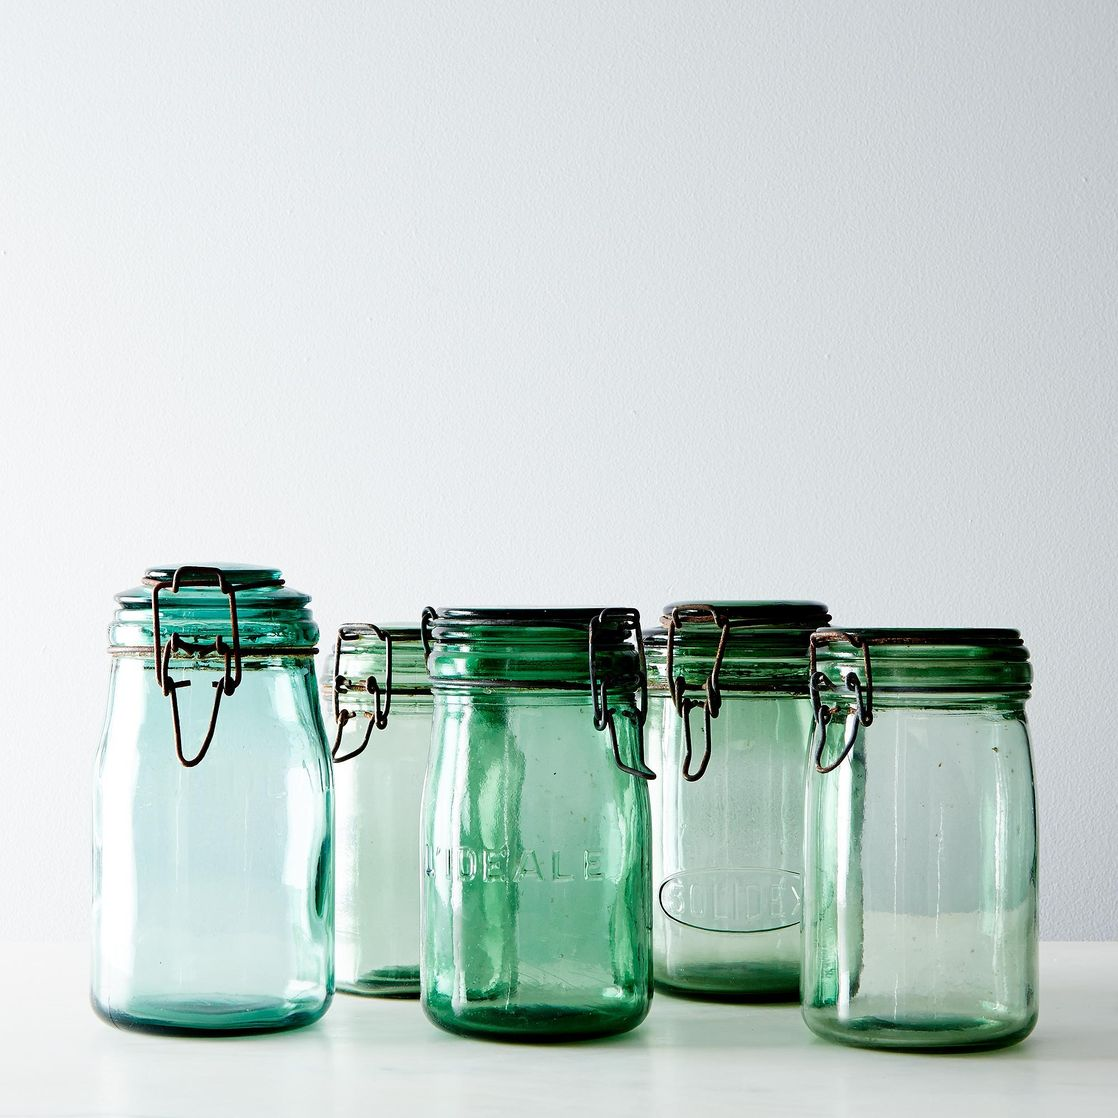 0f712e11-6738-4e89-a413-8aa6b2e21c81--2014-1002_elsie-green-designs_vintage-french-canning-jars-016.jpg